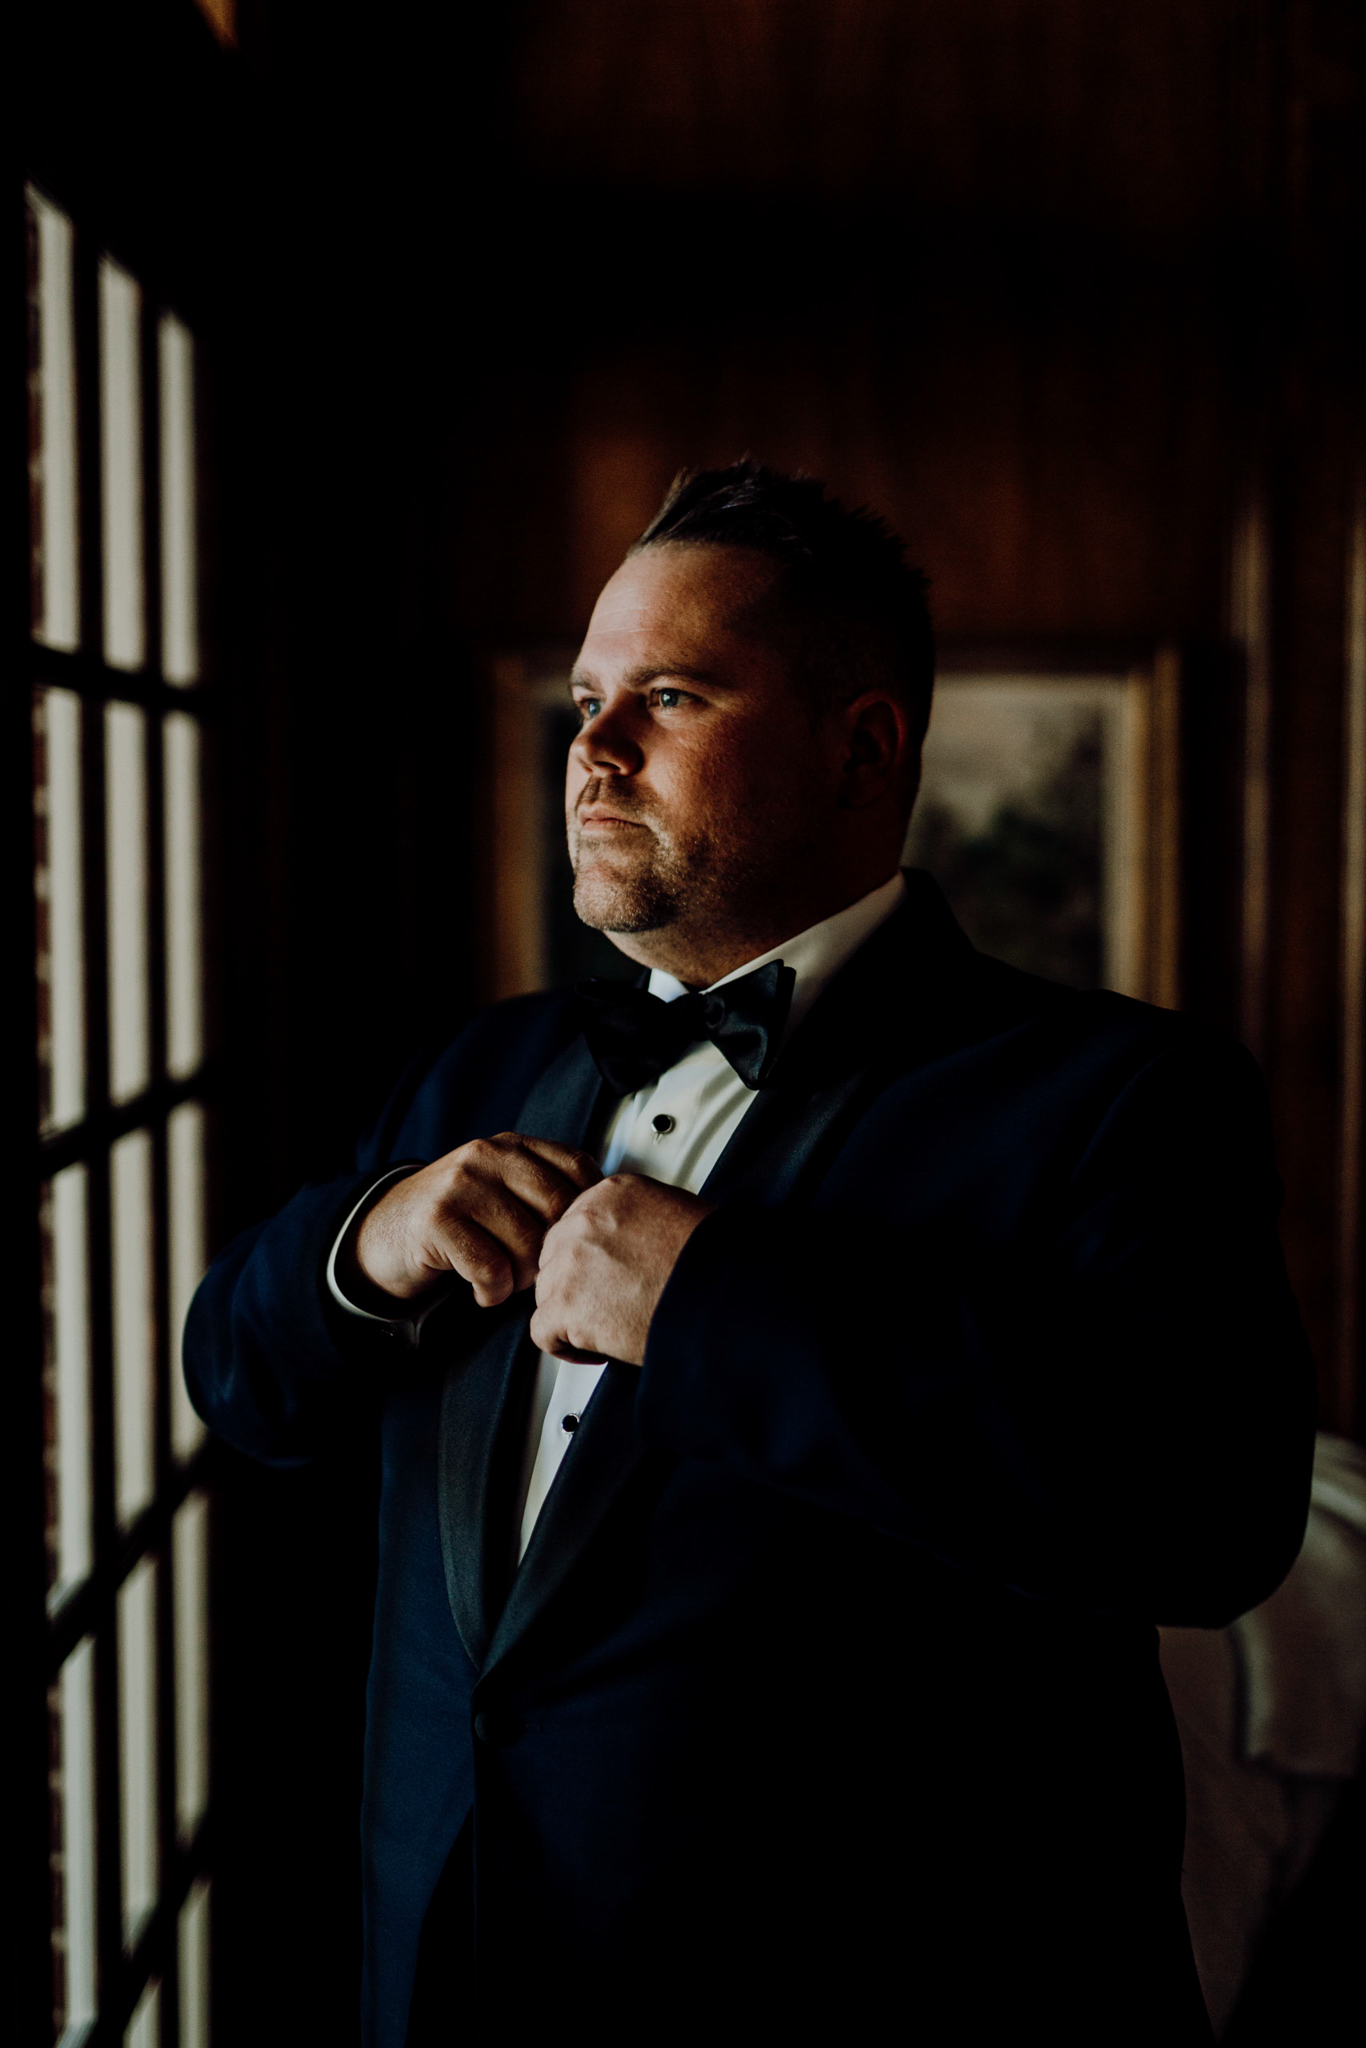 Houston Wedding Photographer-Intimate Texas Backyard Wedding- Houston Wedding Photographer -Kristen Giles Photography-20.jpg